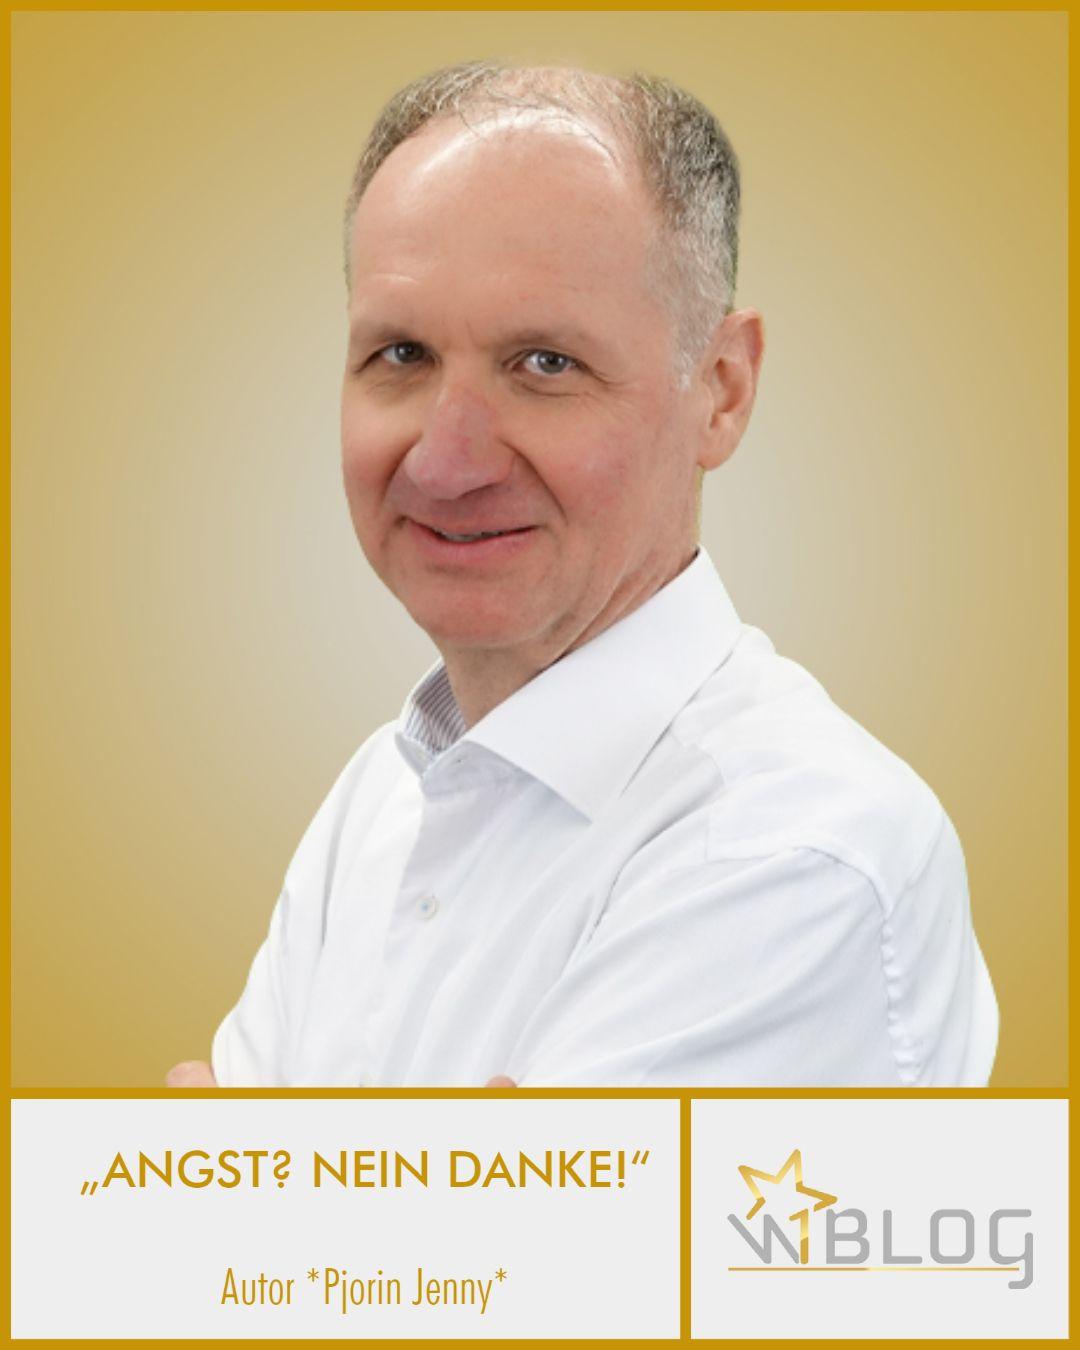 Angst - nein Danke - Interview